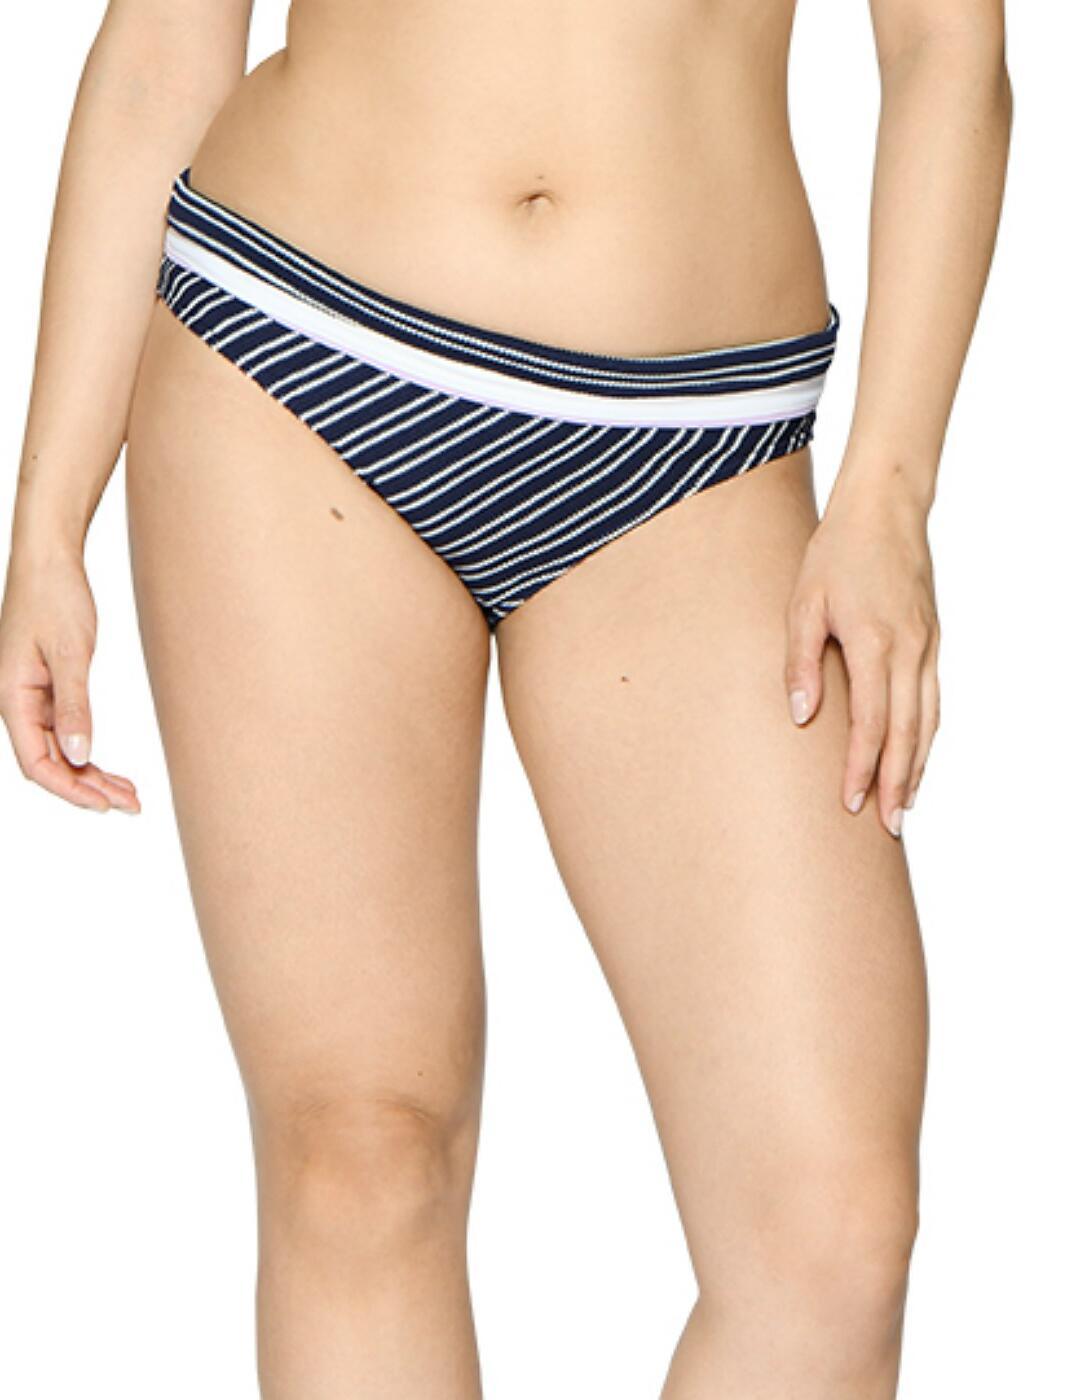 CS003503 Curvy Kate Sailor Girl Fold Bikini Brief - CS003503 Navy